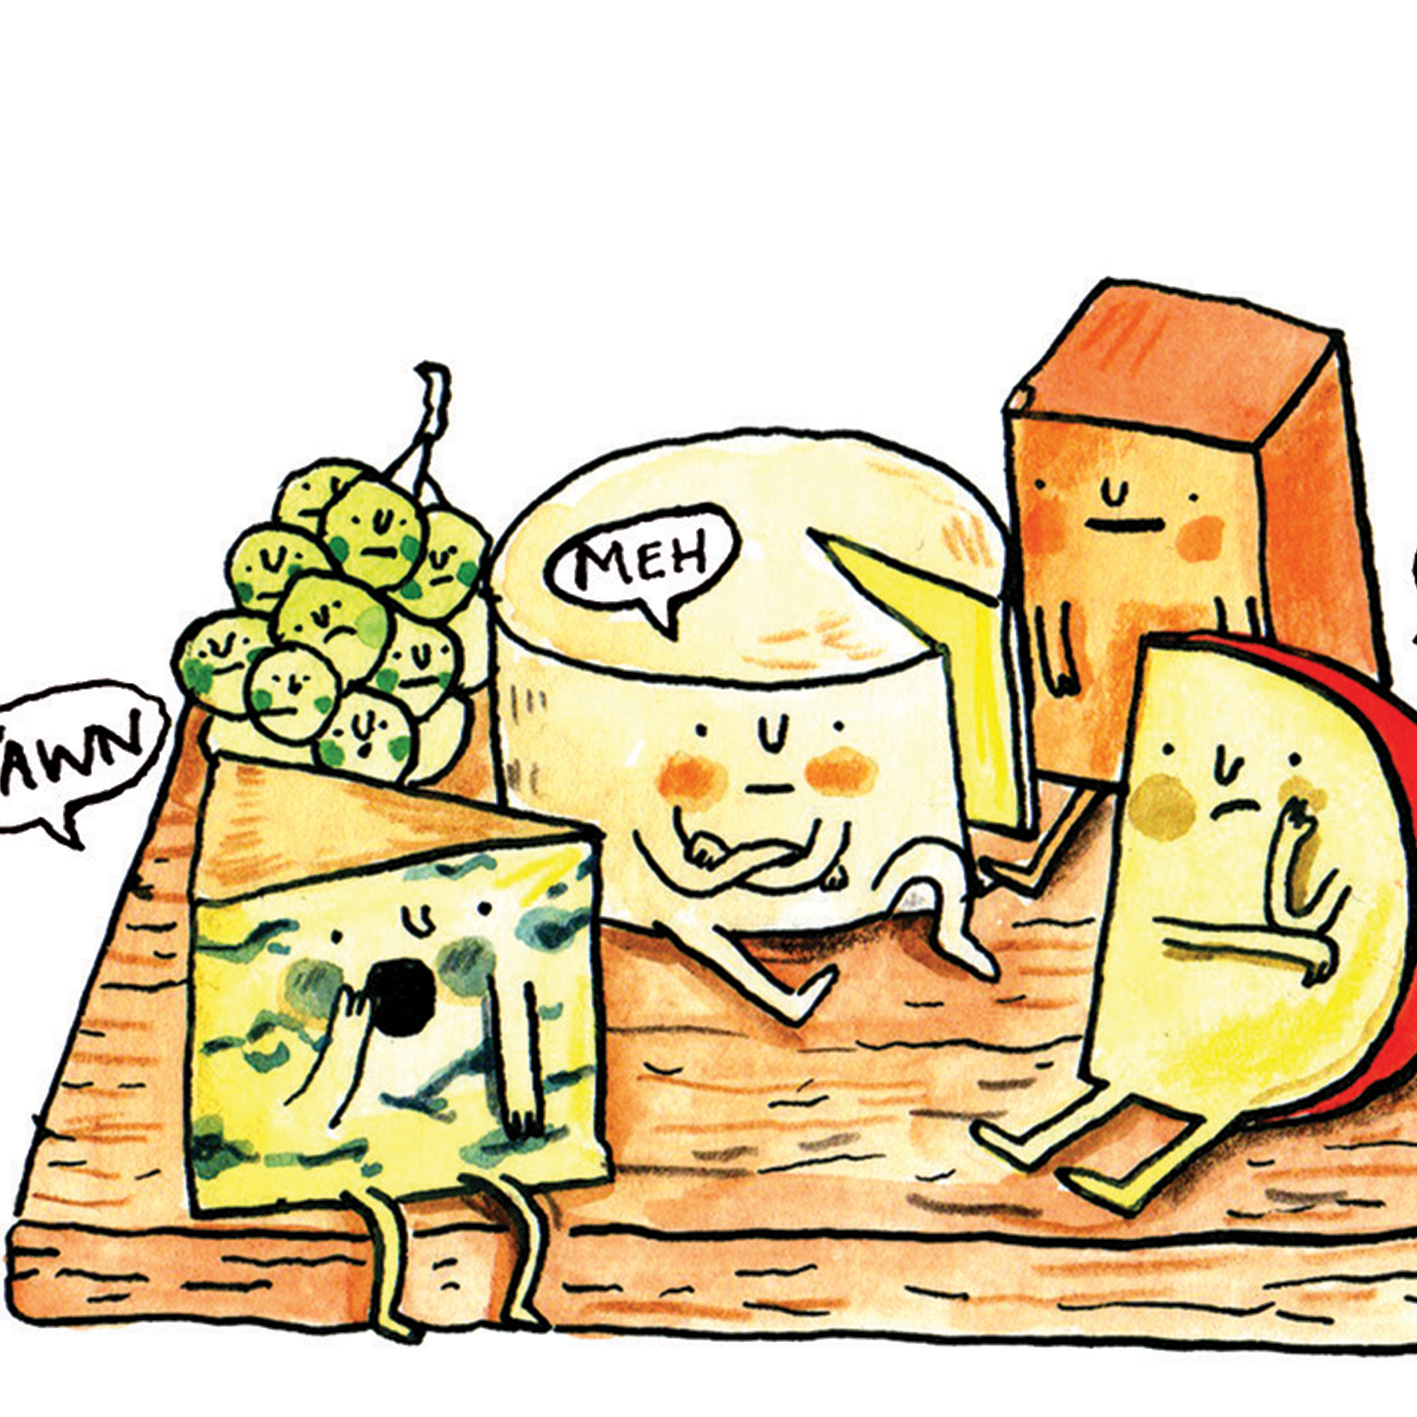 Cheese-Board_-Romantic-cheese-pun-greetings-card_SM69_CU